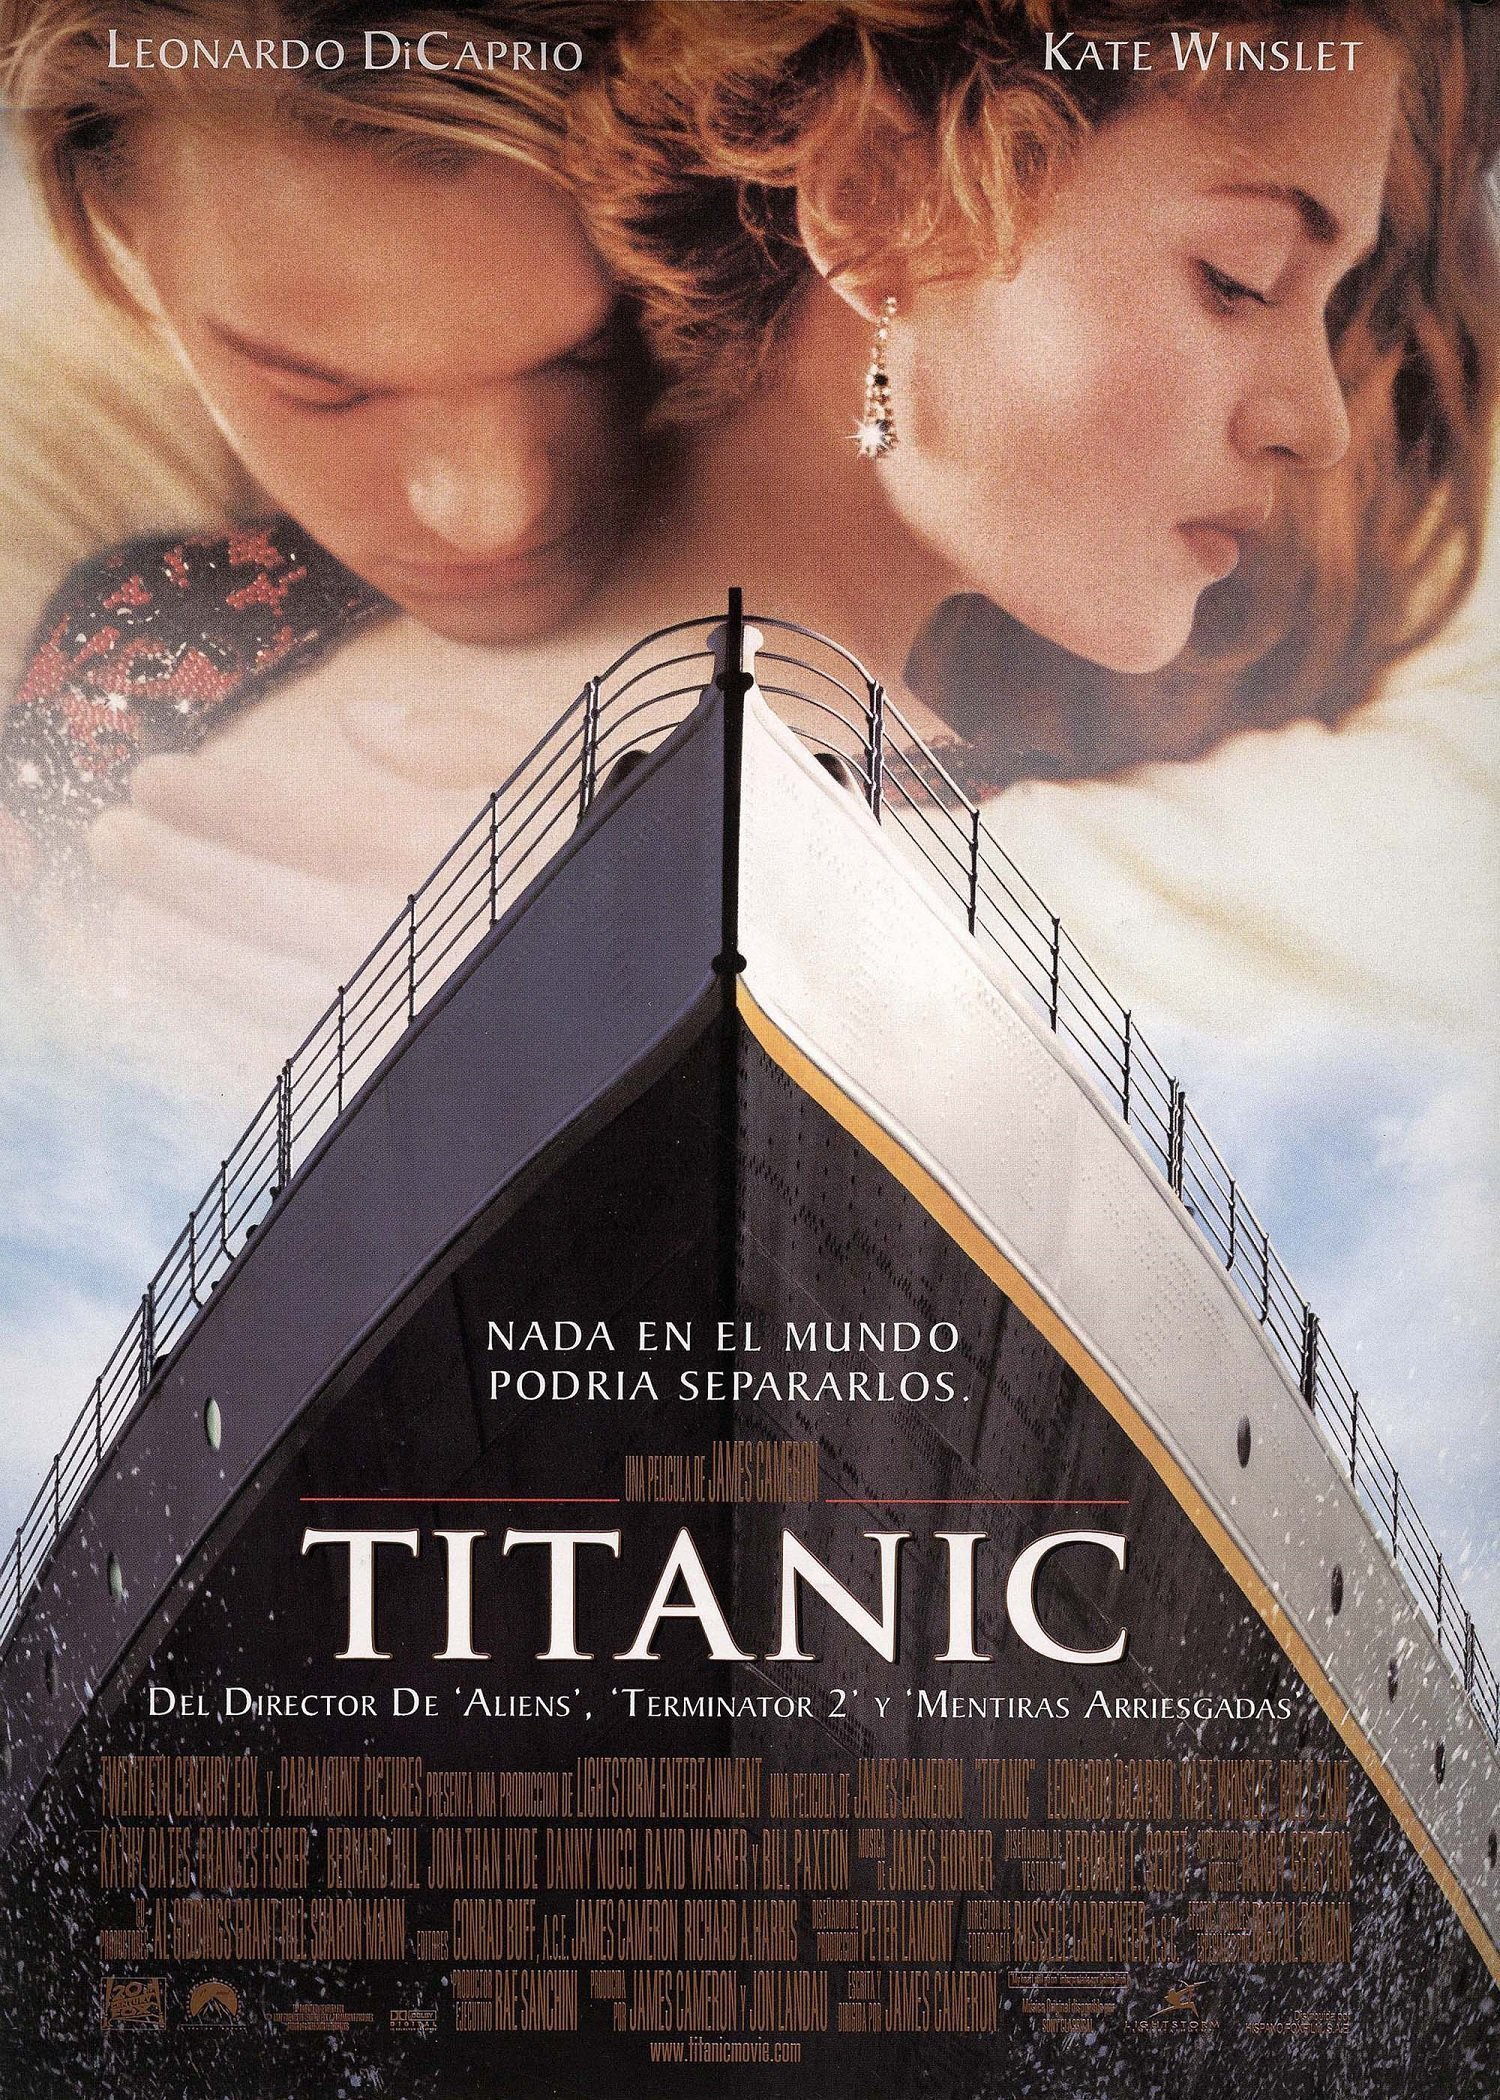 Titanic 2012 Película Play Cine